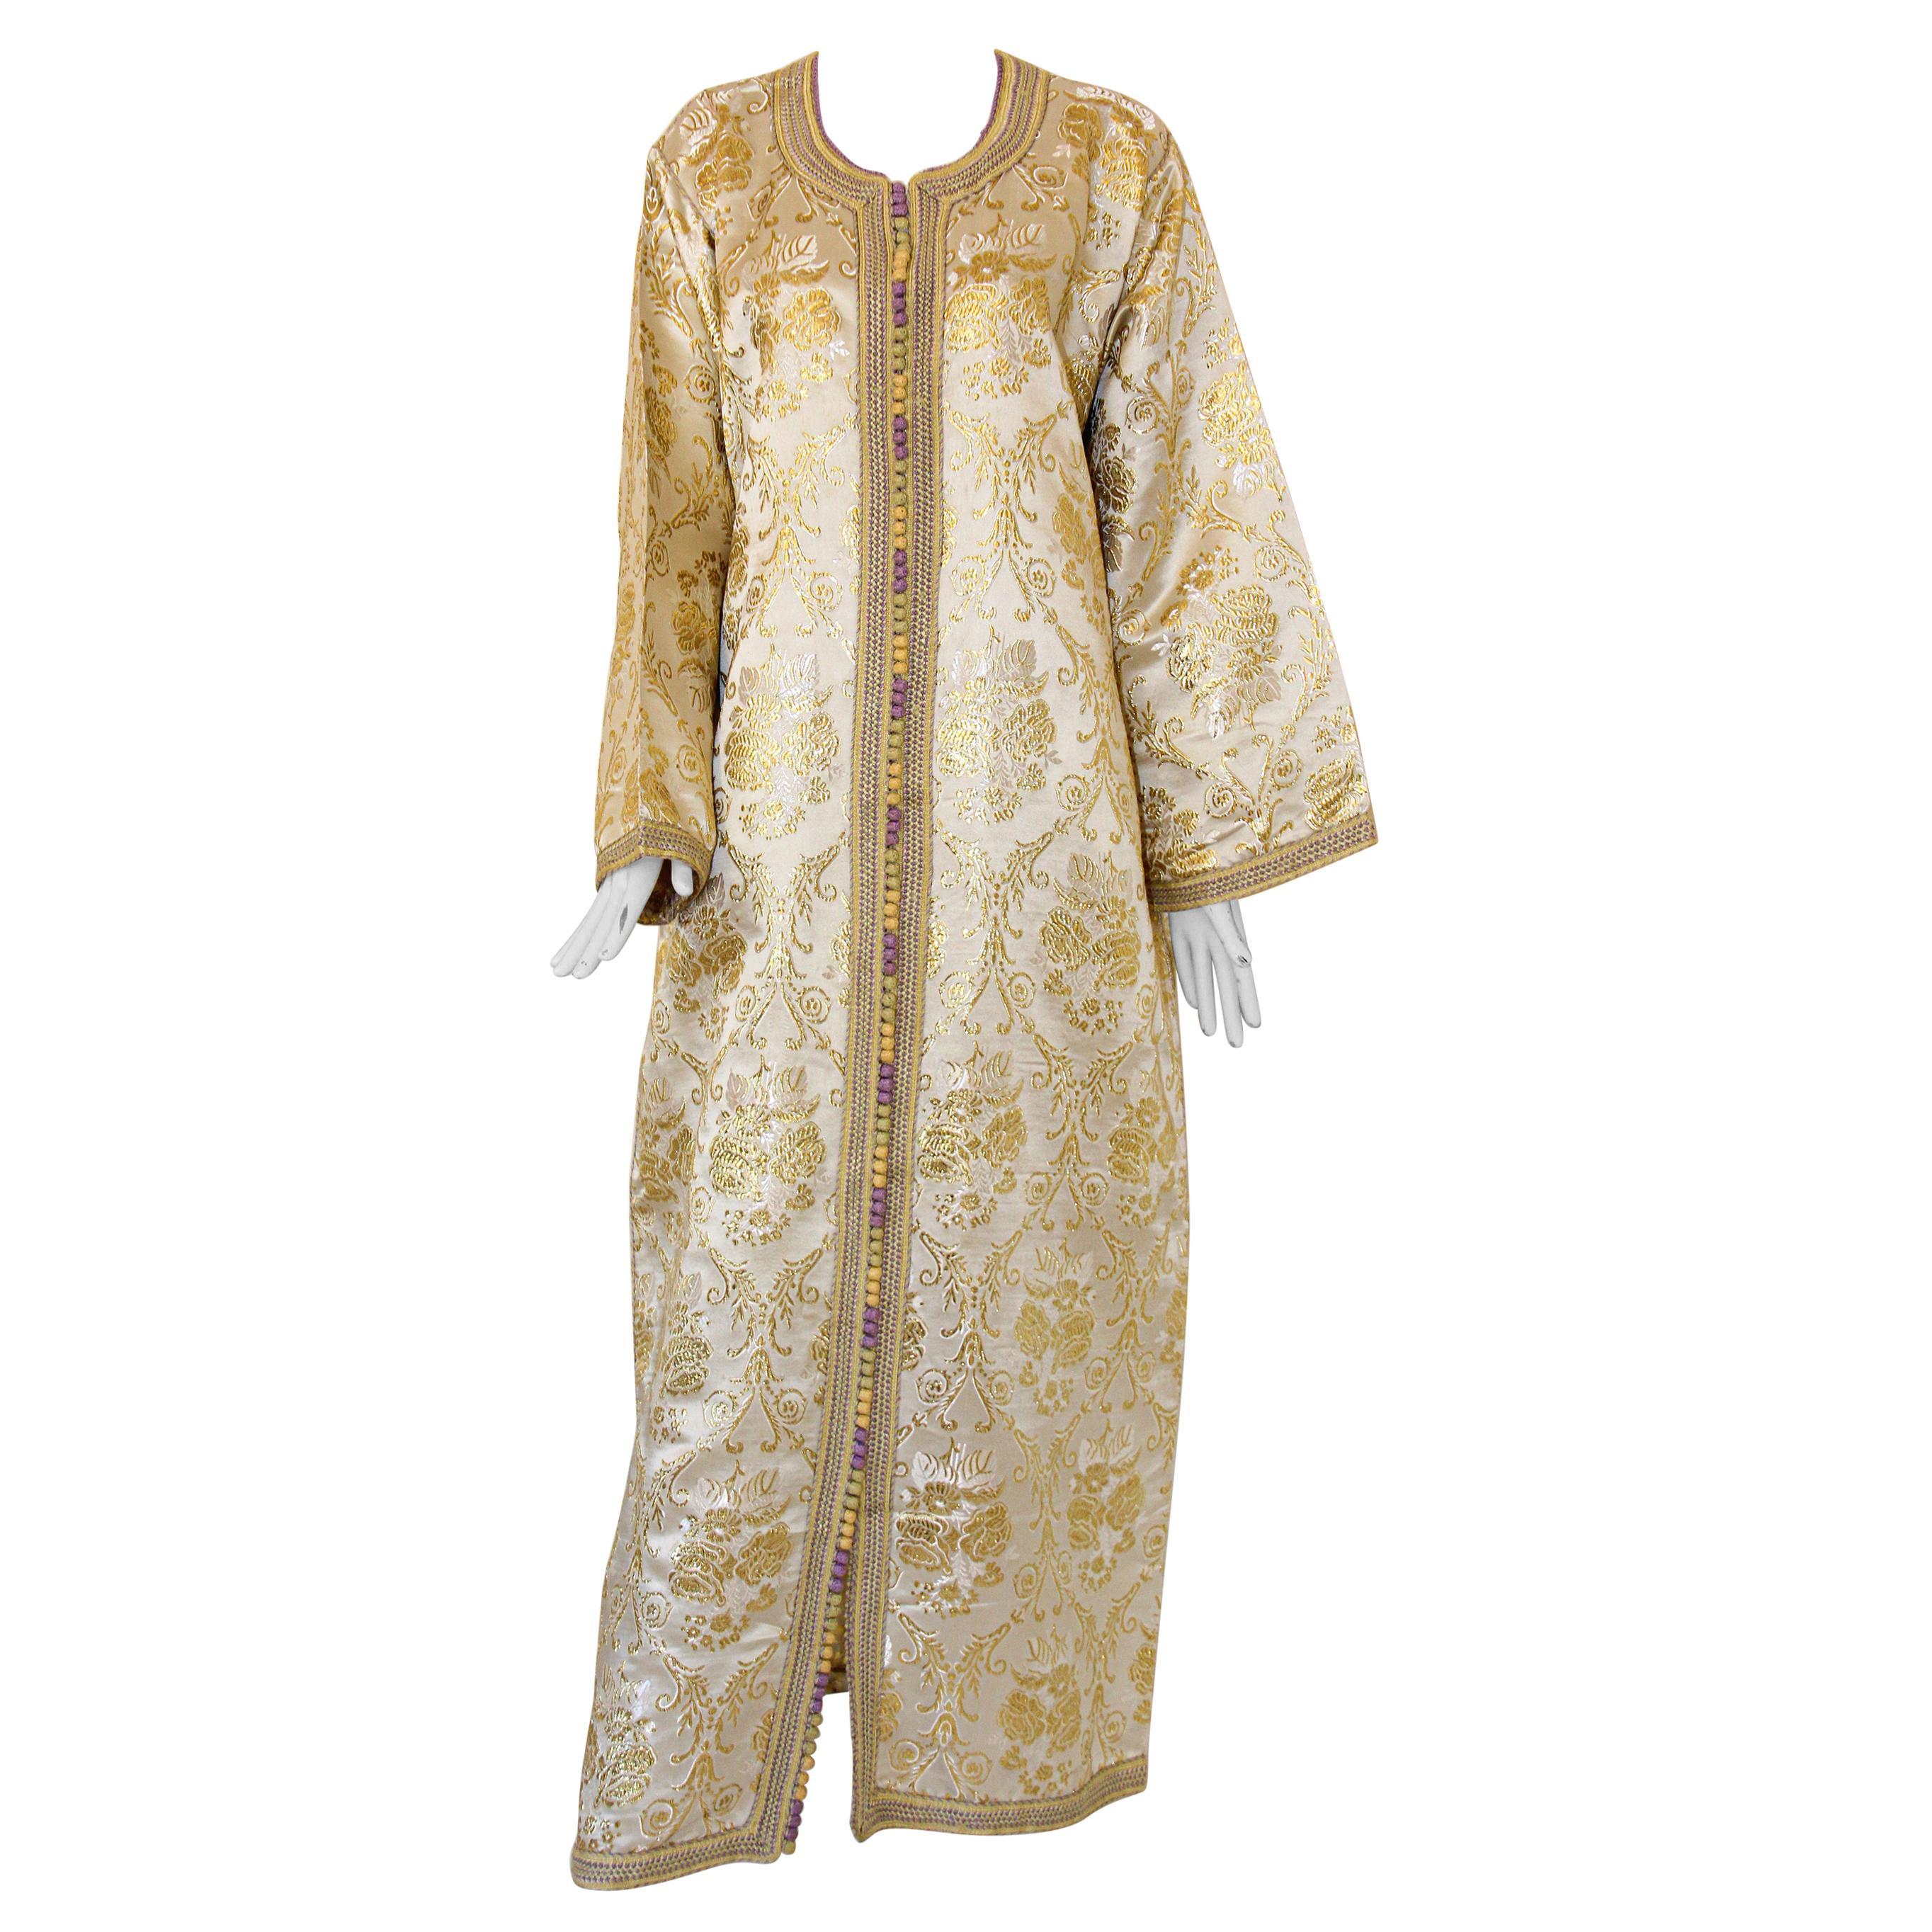 Moroccan Vintage Caftan in Gold Metallic Brocade, Maxi Gown Dress Kaftan